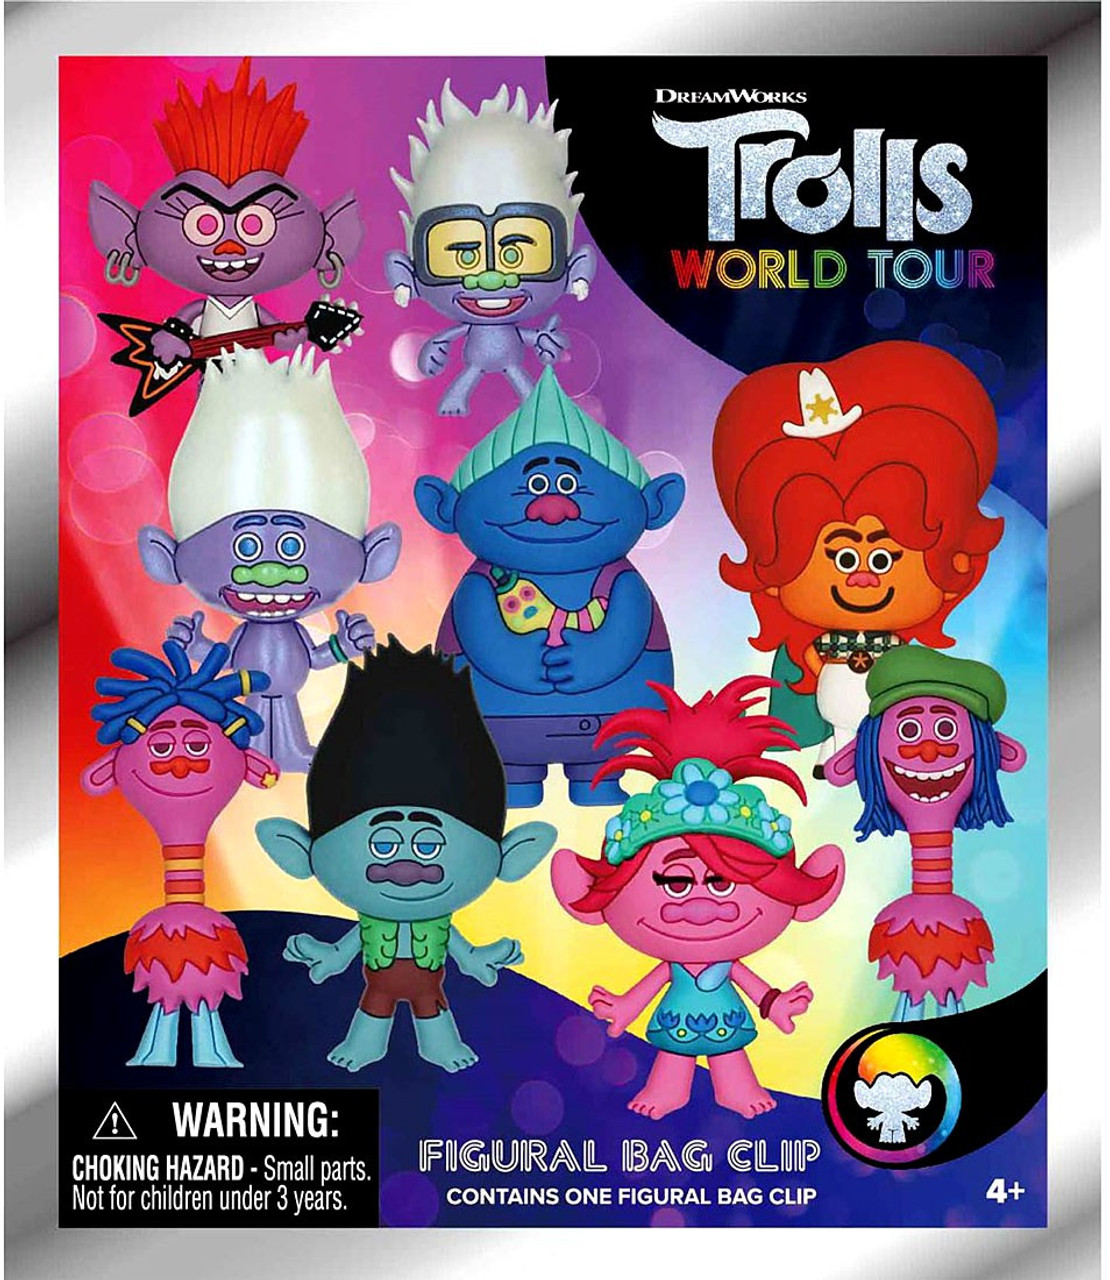 DREAMWORKS TROLLS WORLD TOUR TRADING CARD GAME BUNDLE = 10 PACKETS